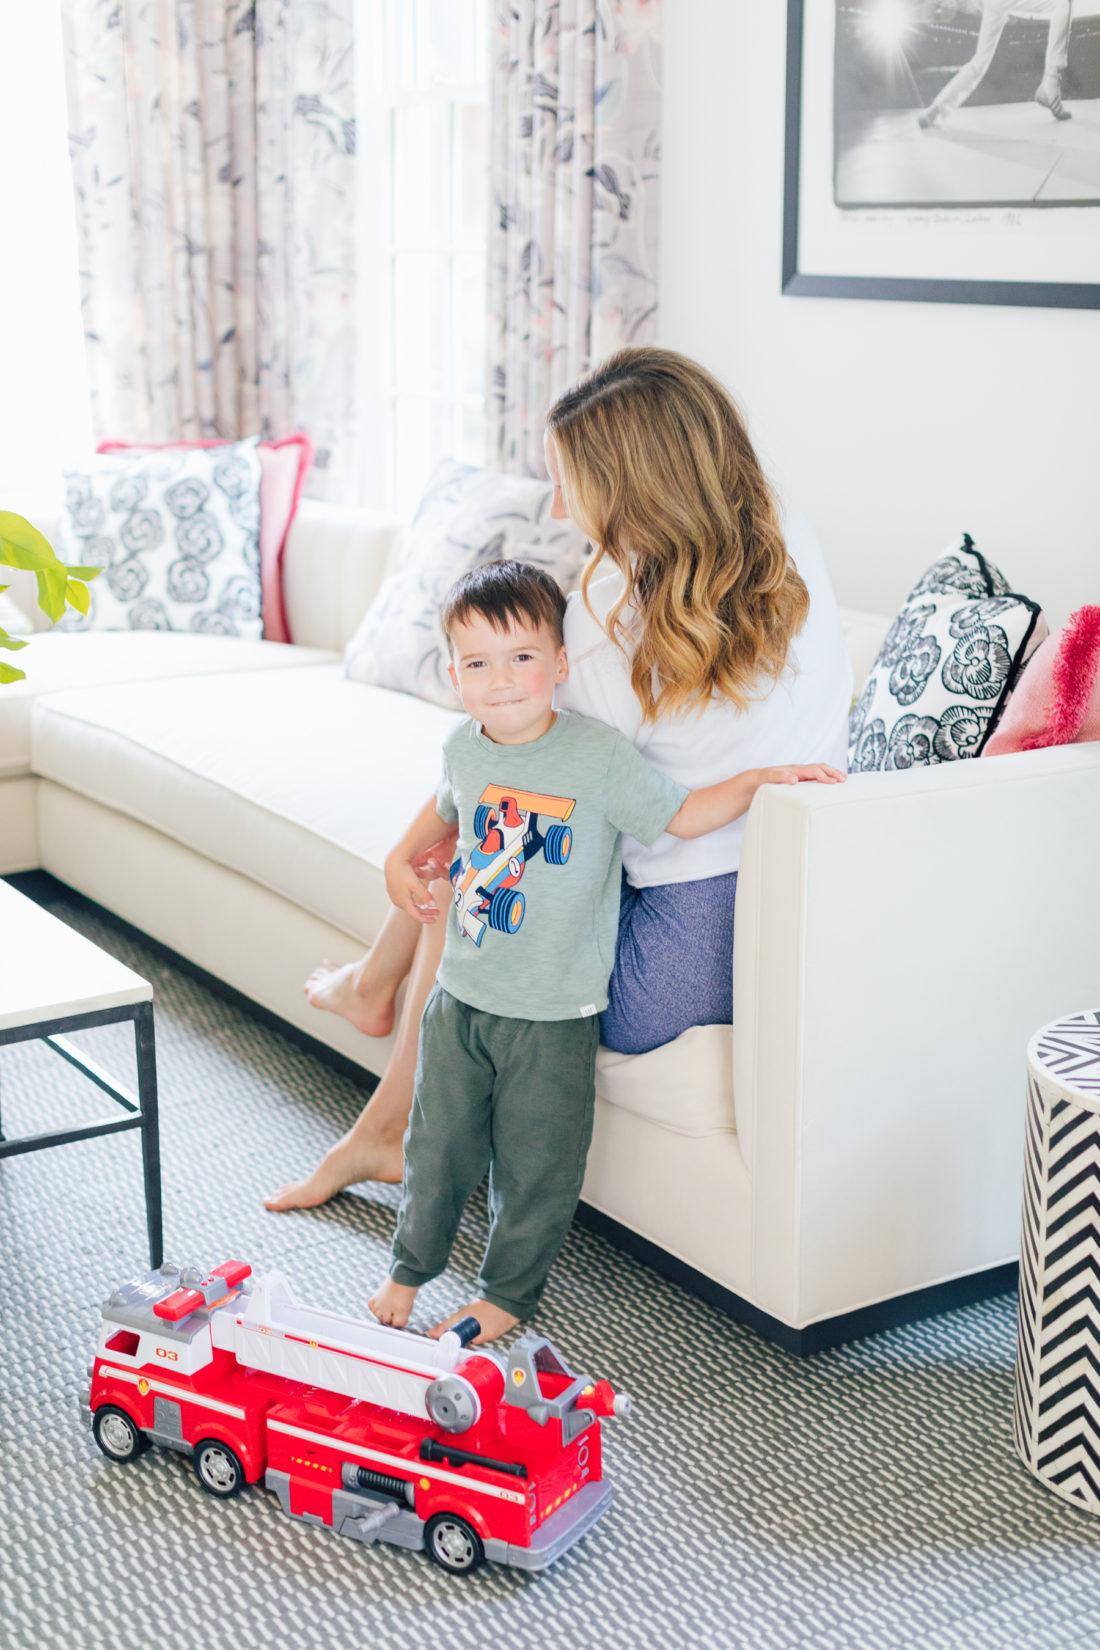 Eva Amurri Martino plays with son Major in a rainbow sweatshirt showing off her easy pretty curls